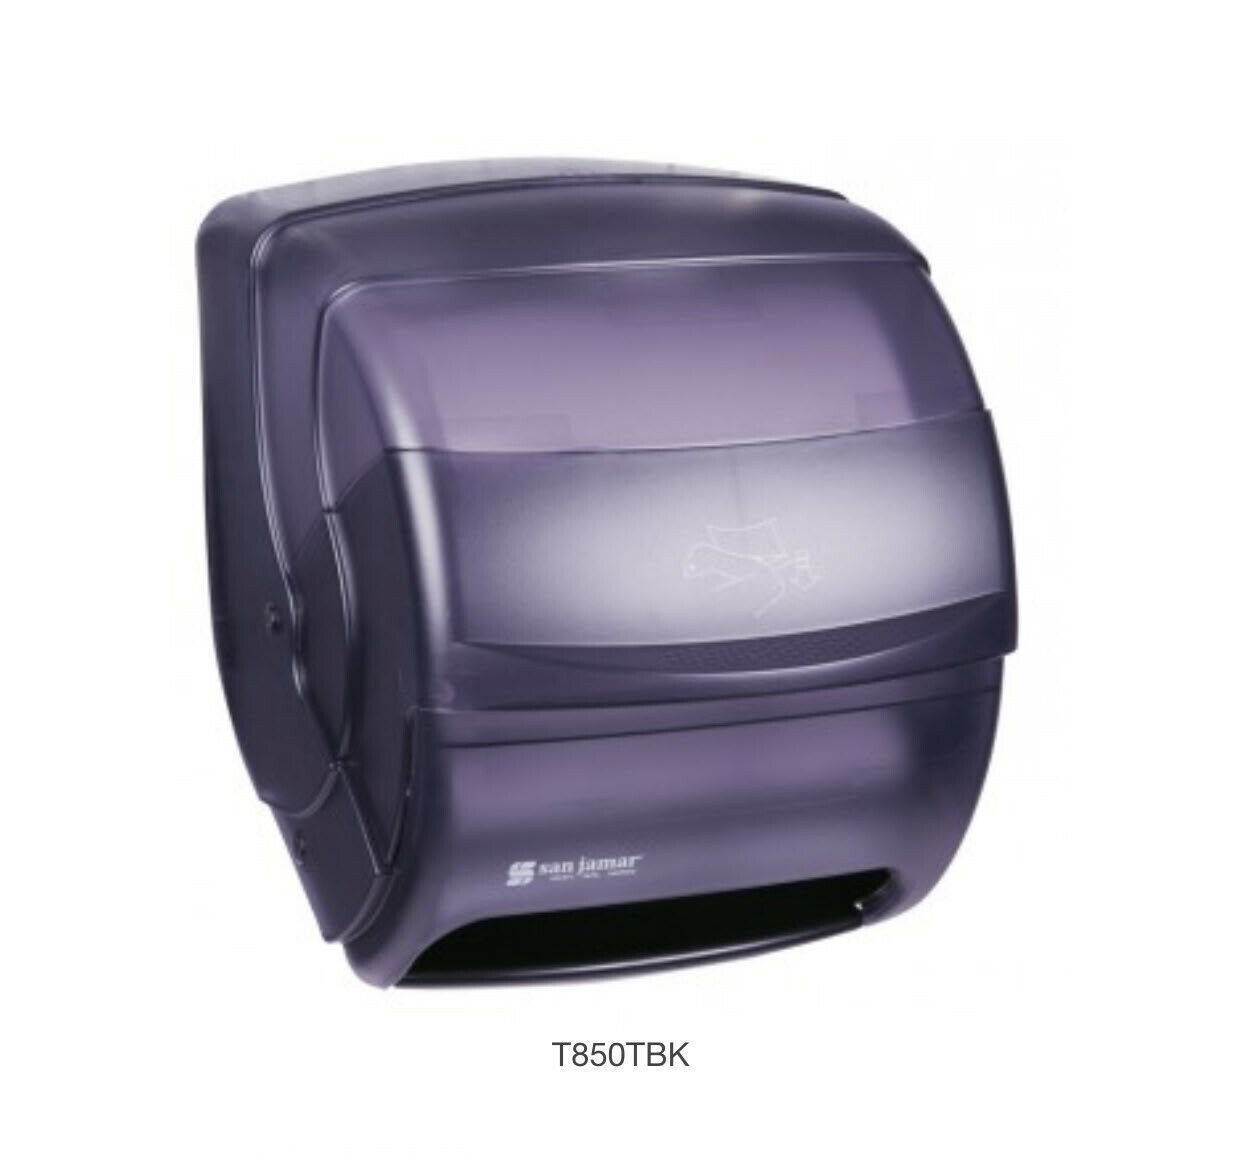 Enviromaster T850tbkenv Integra Roll Towel Dispenser Black Pearl For Sale Online Ebay